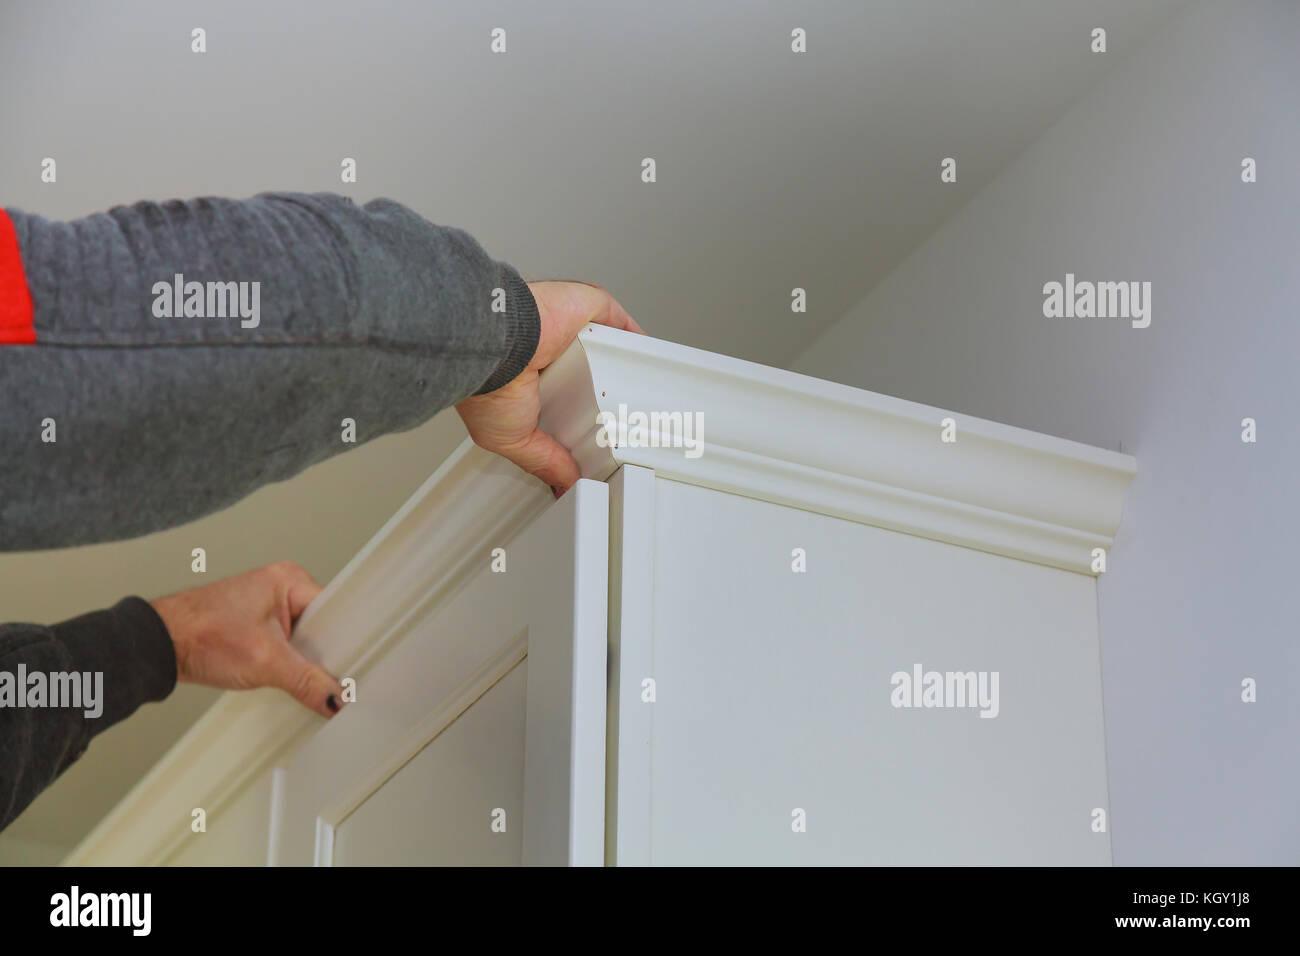 Carpenter Nailing On Wood Framing Imágenes De Stock & Carpenter ...